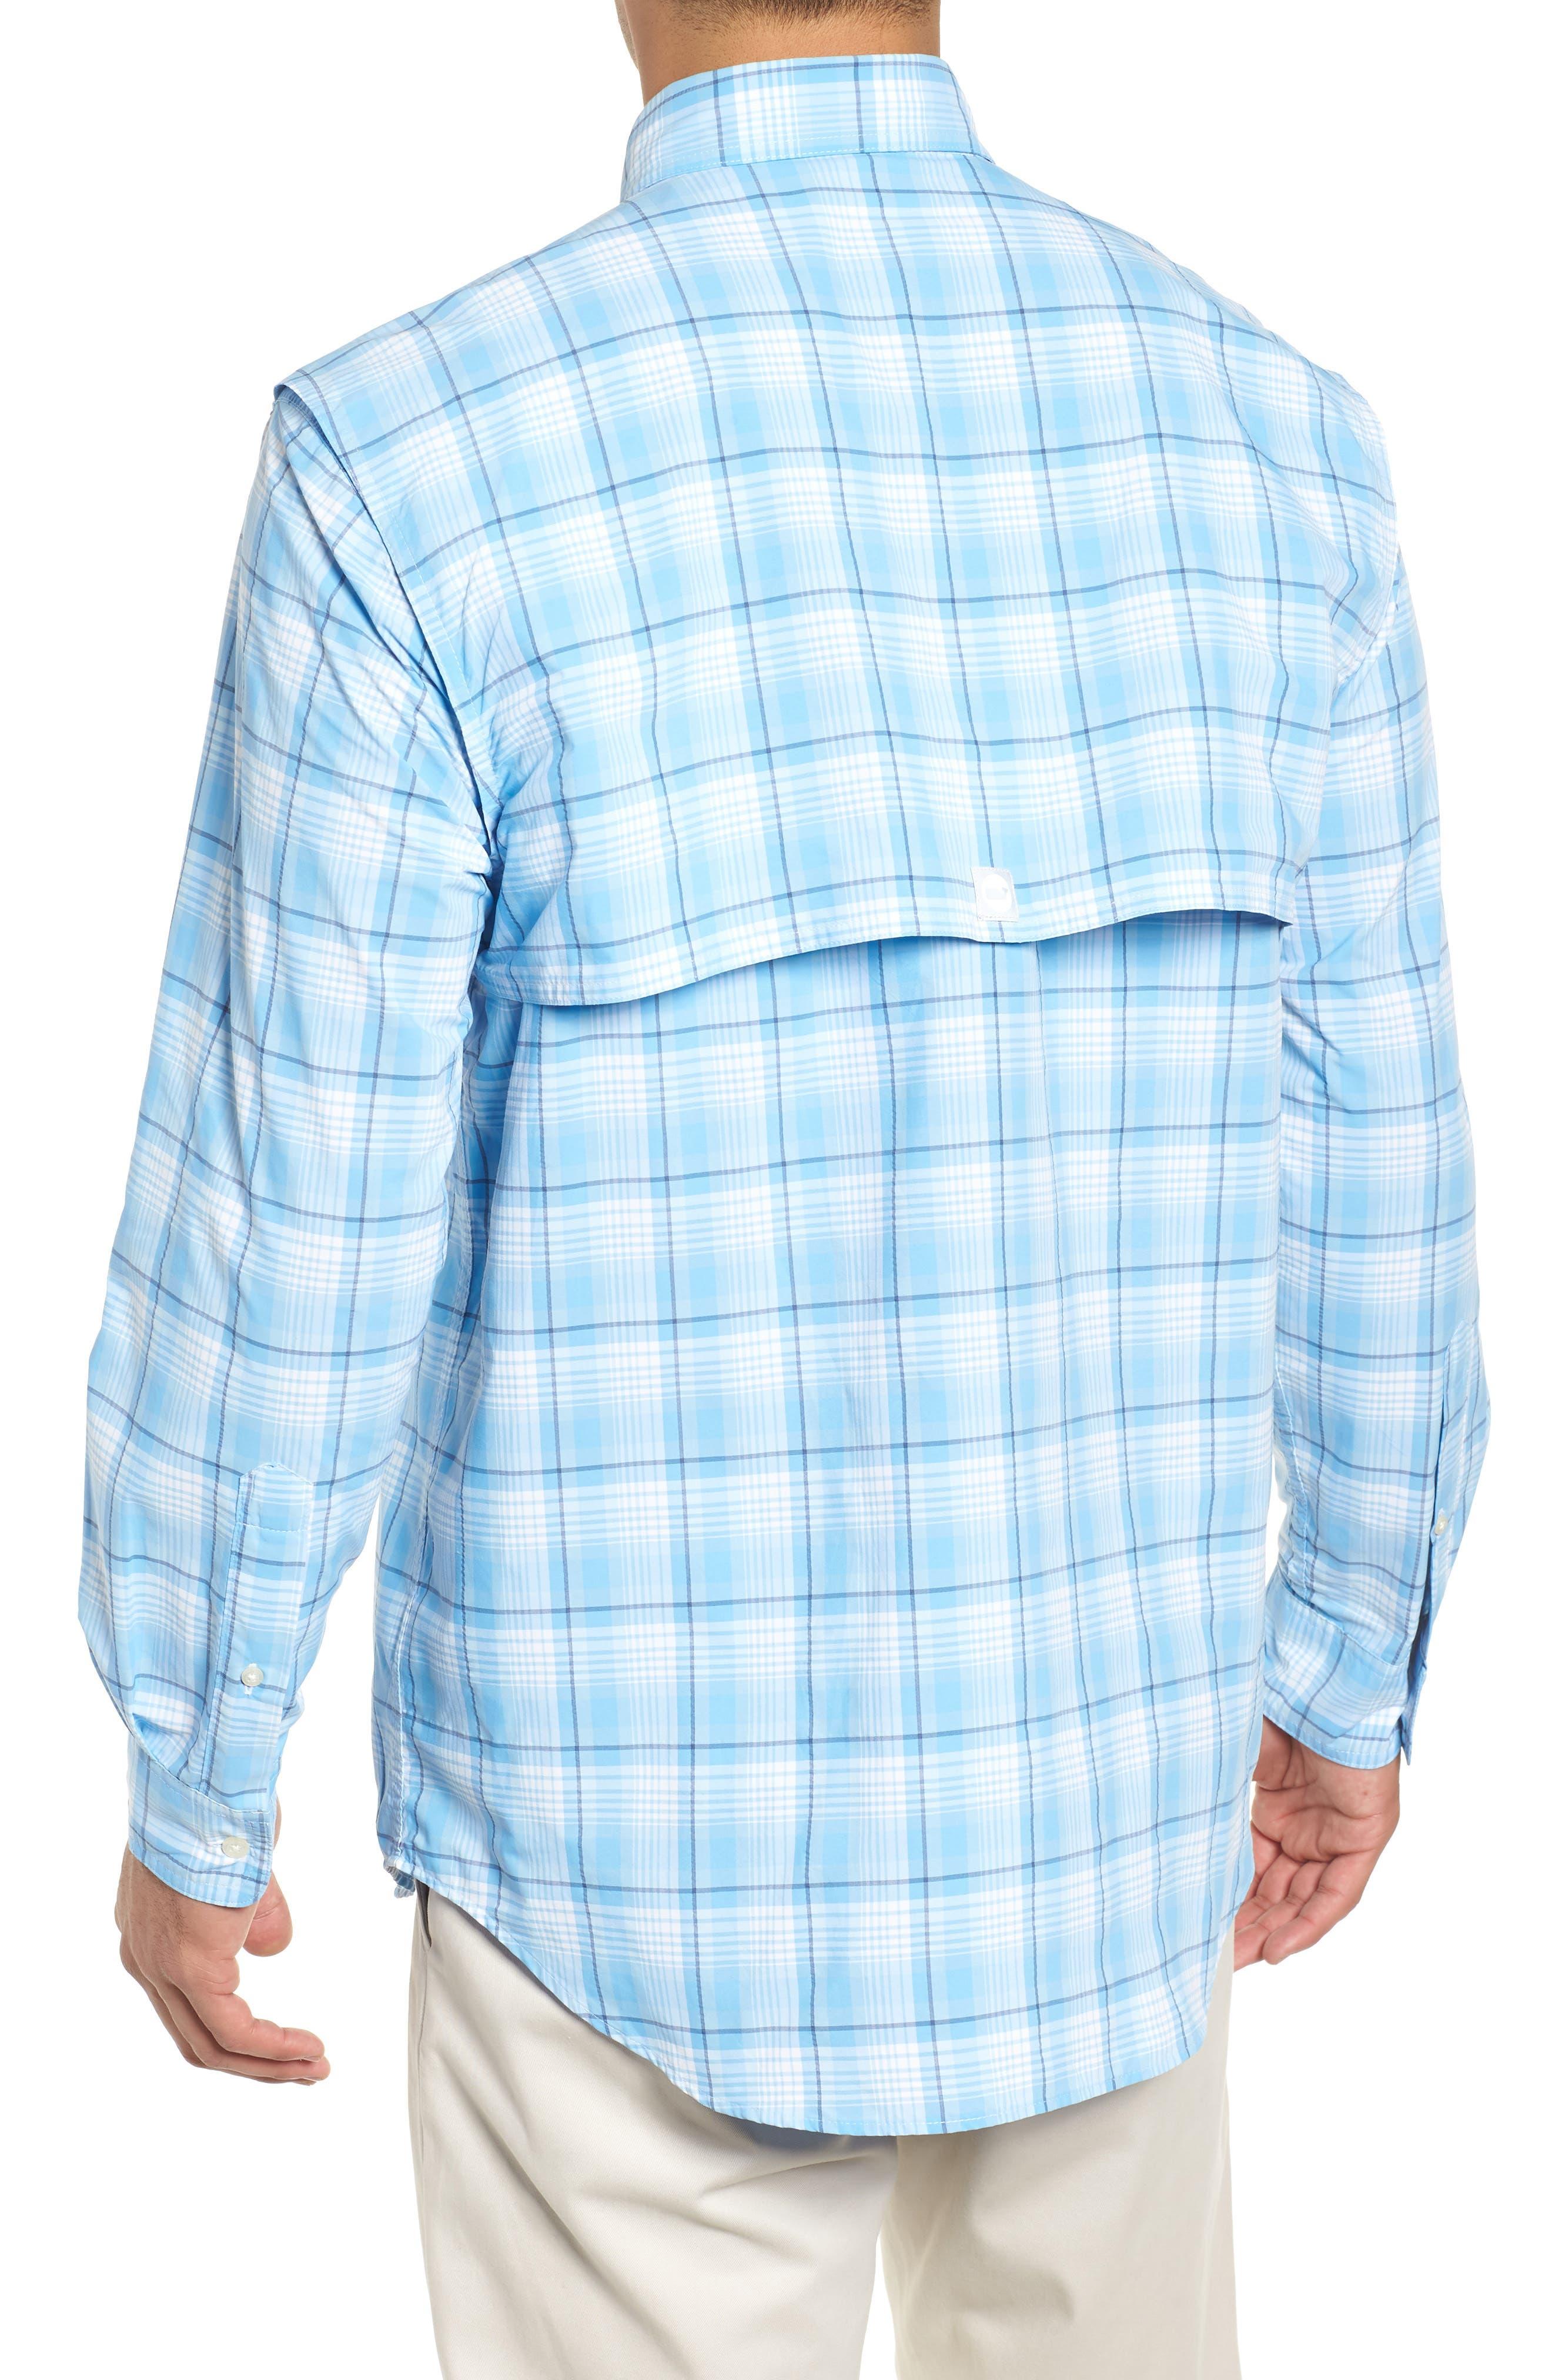 Mariners Way Harbor Regular Fit Performance Sport Shirt,                             Alternate thumbnail 3, color,                             456